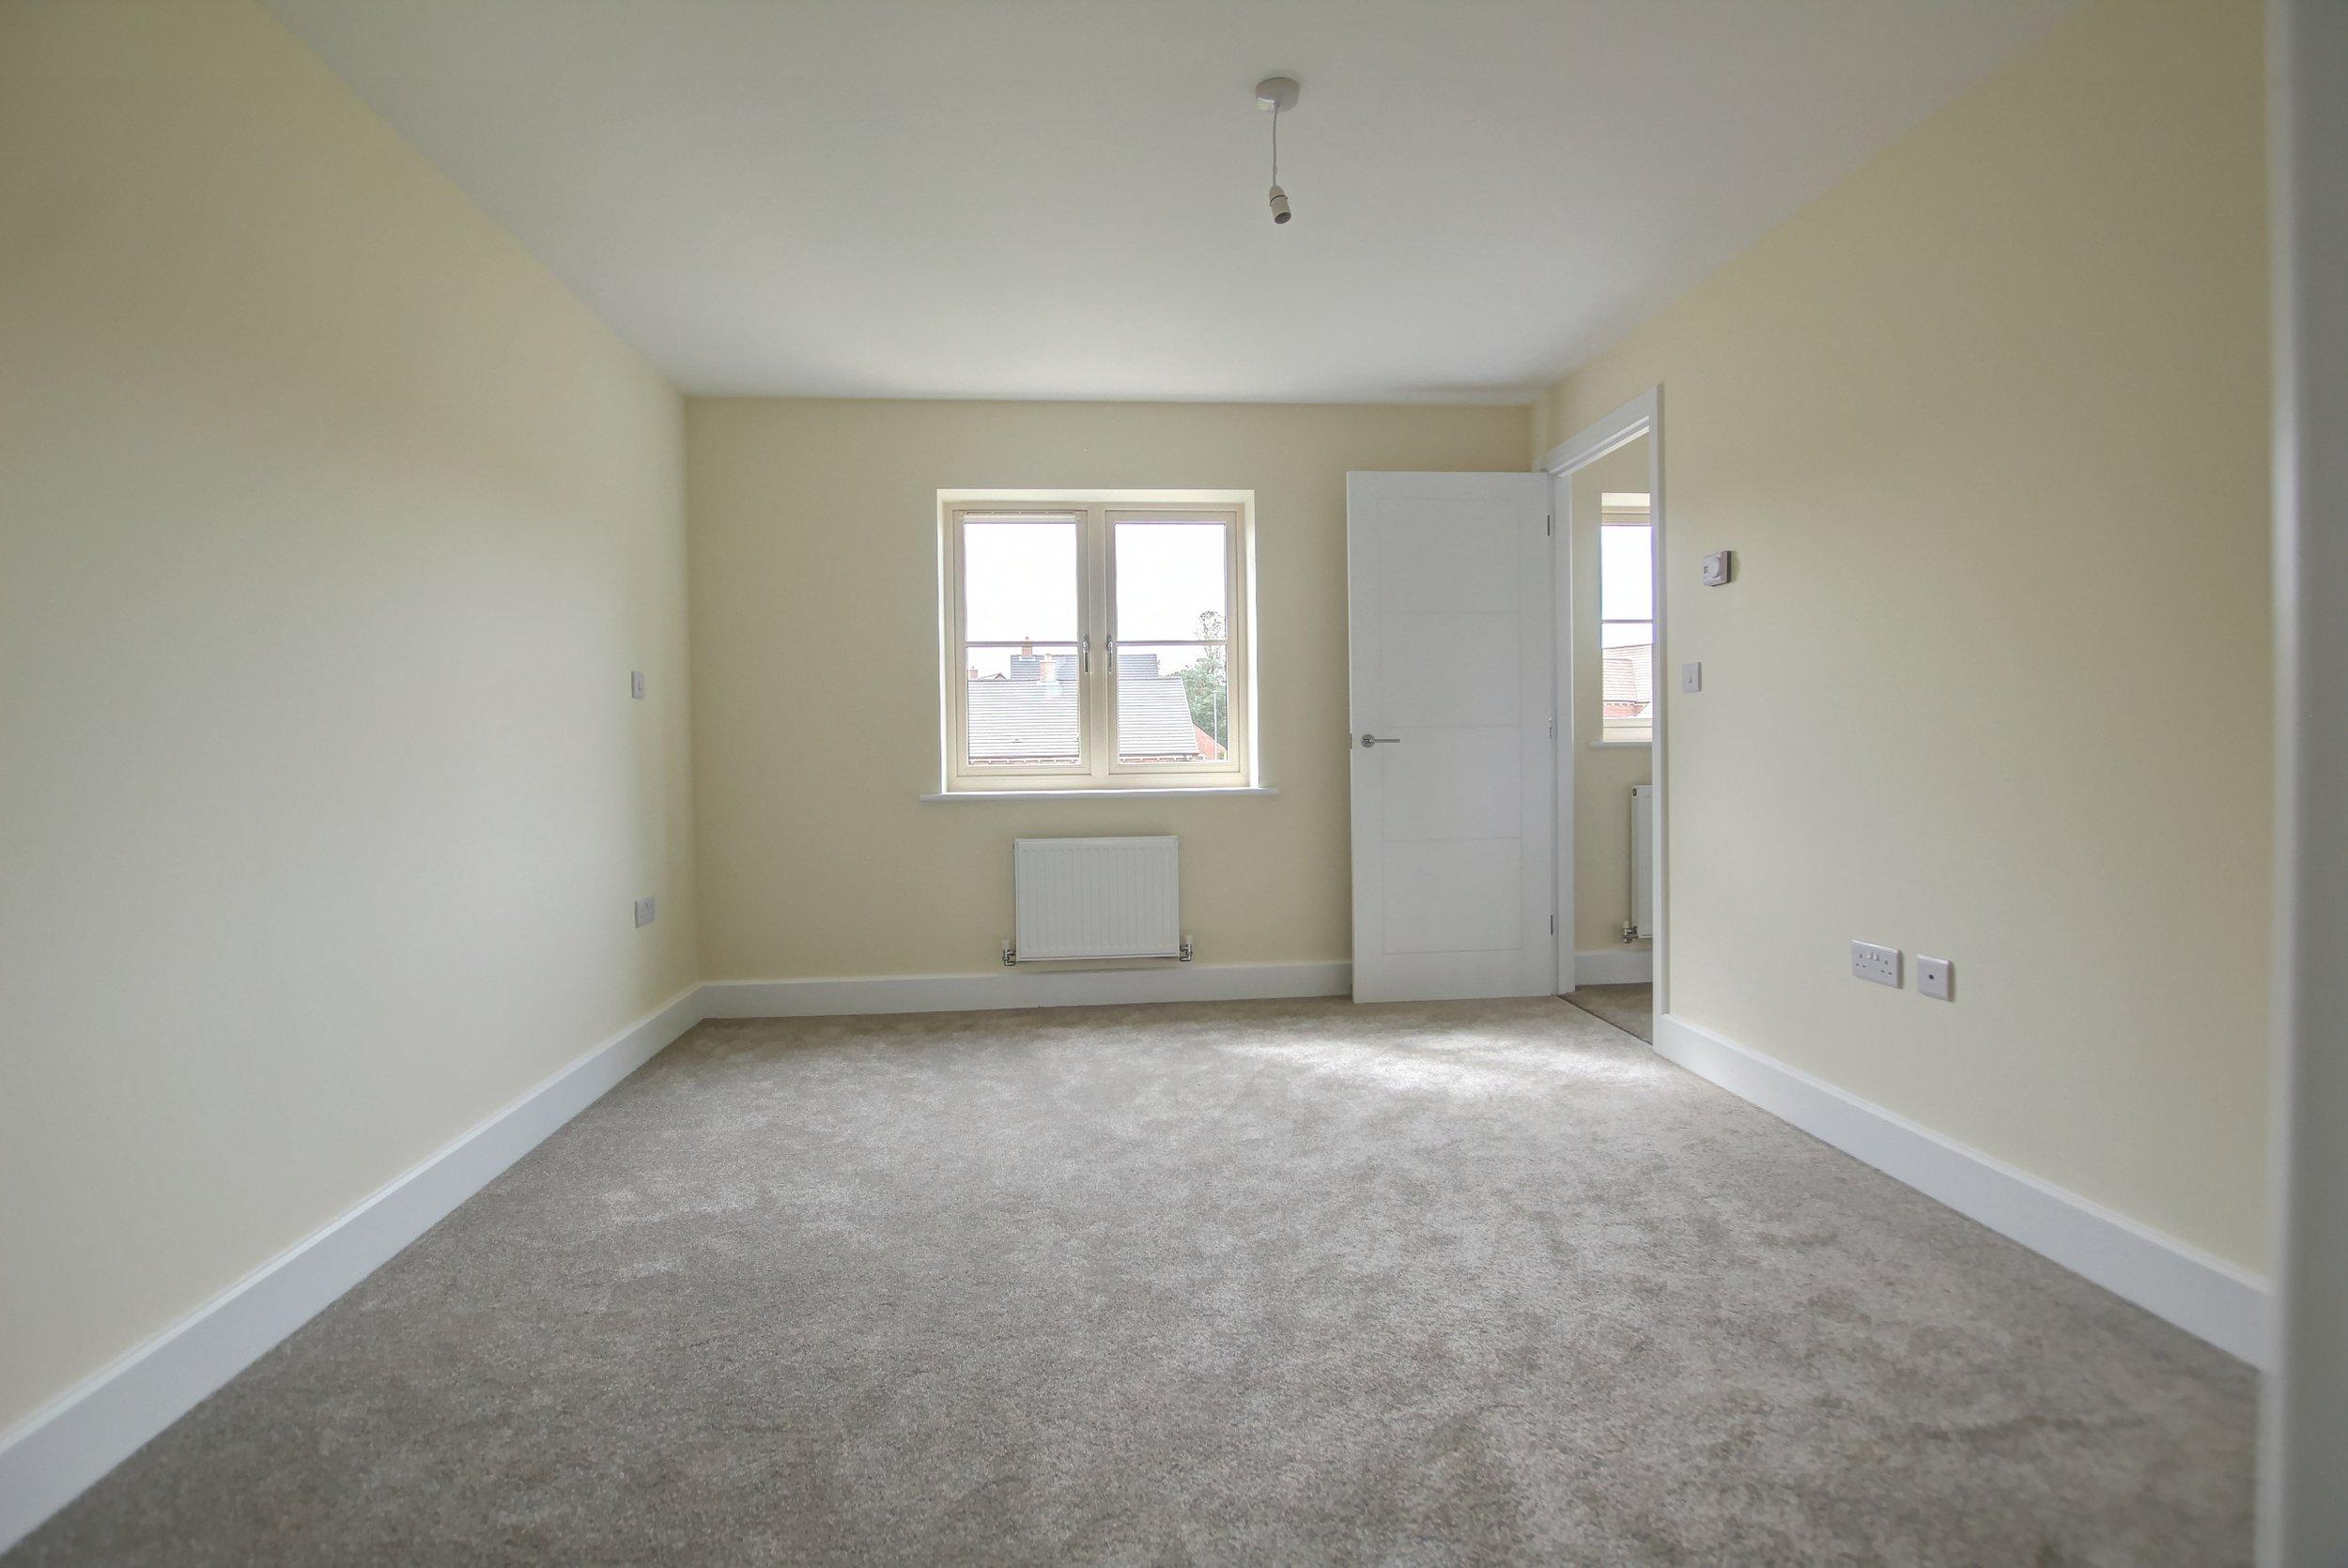 18 bedroom.jpg